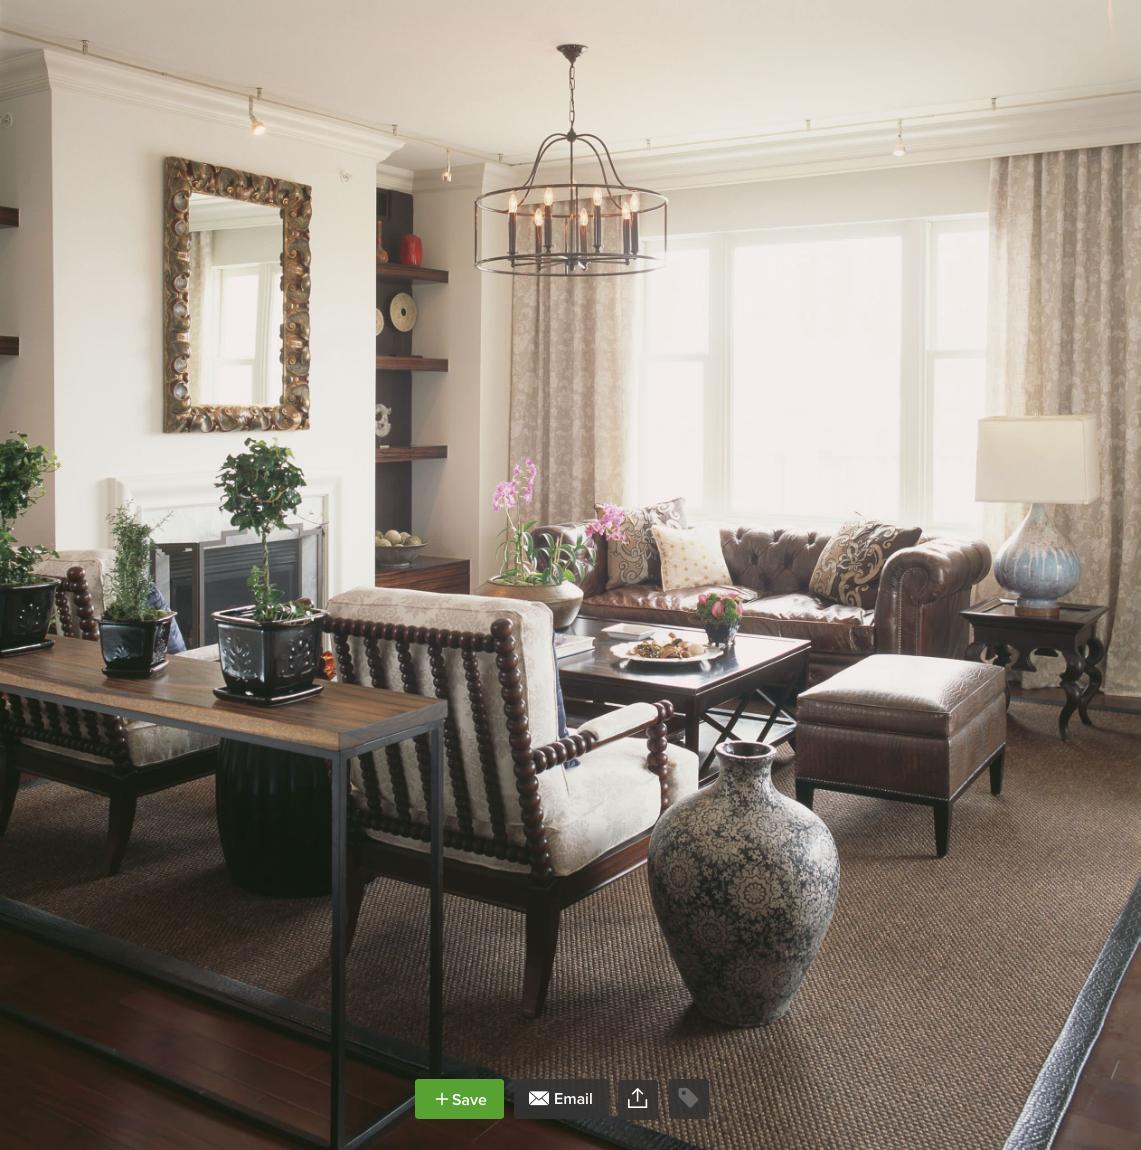 Best Brown Sofa Living Room Image By Mrs Eaves On Corner 400 x 300